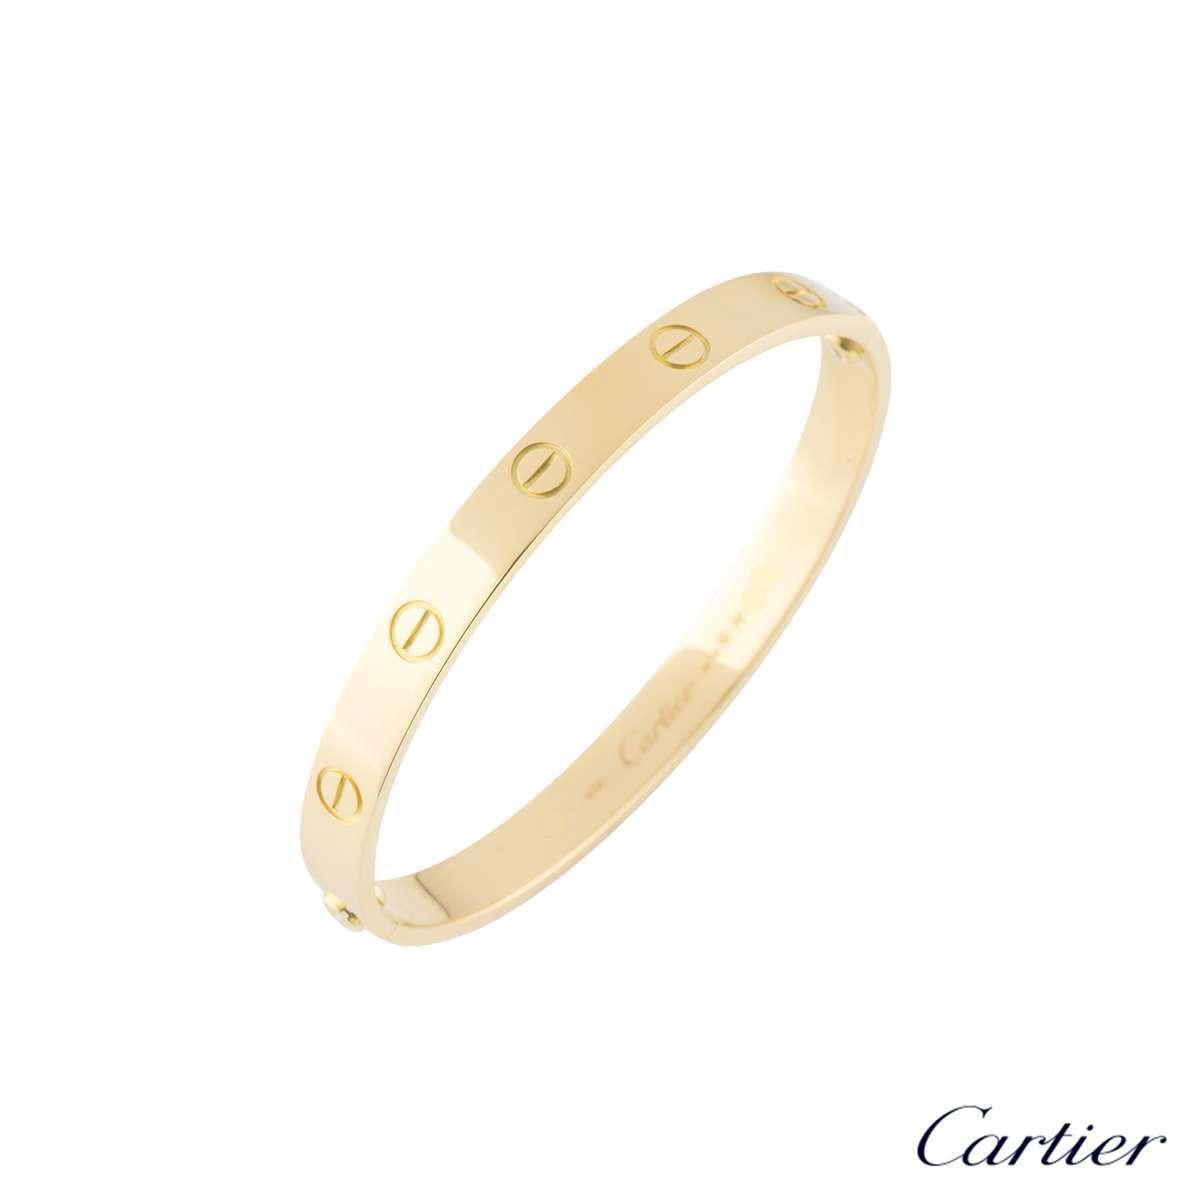 CartierYellow Gold Plain Love Bracelet Size 21B6035521